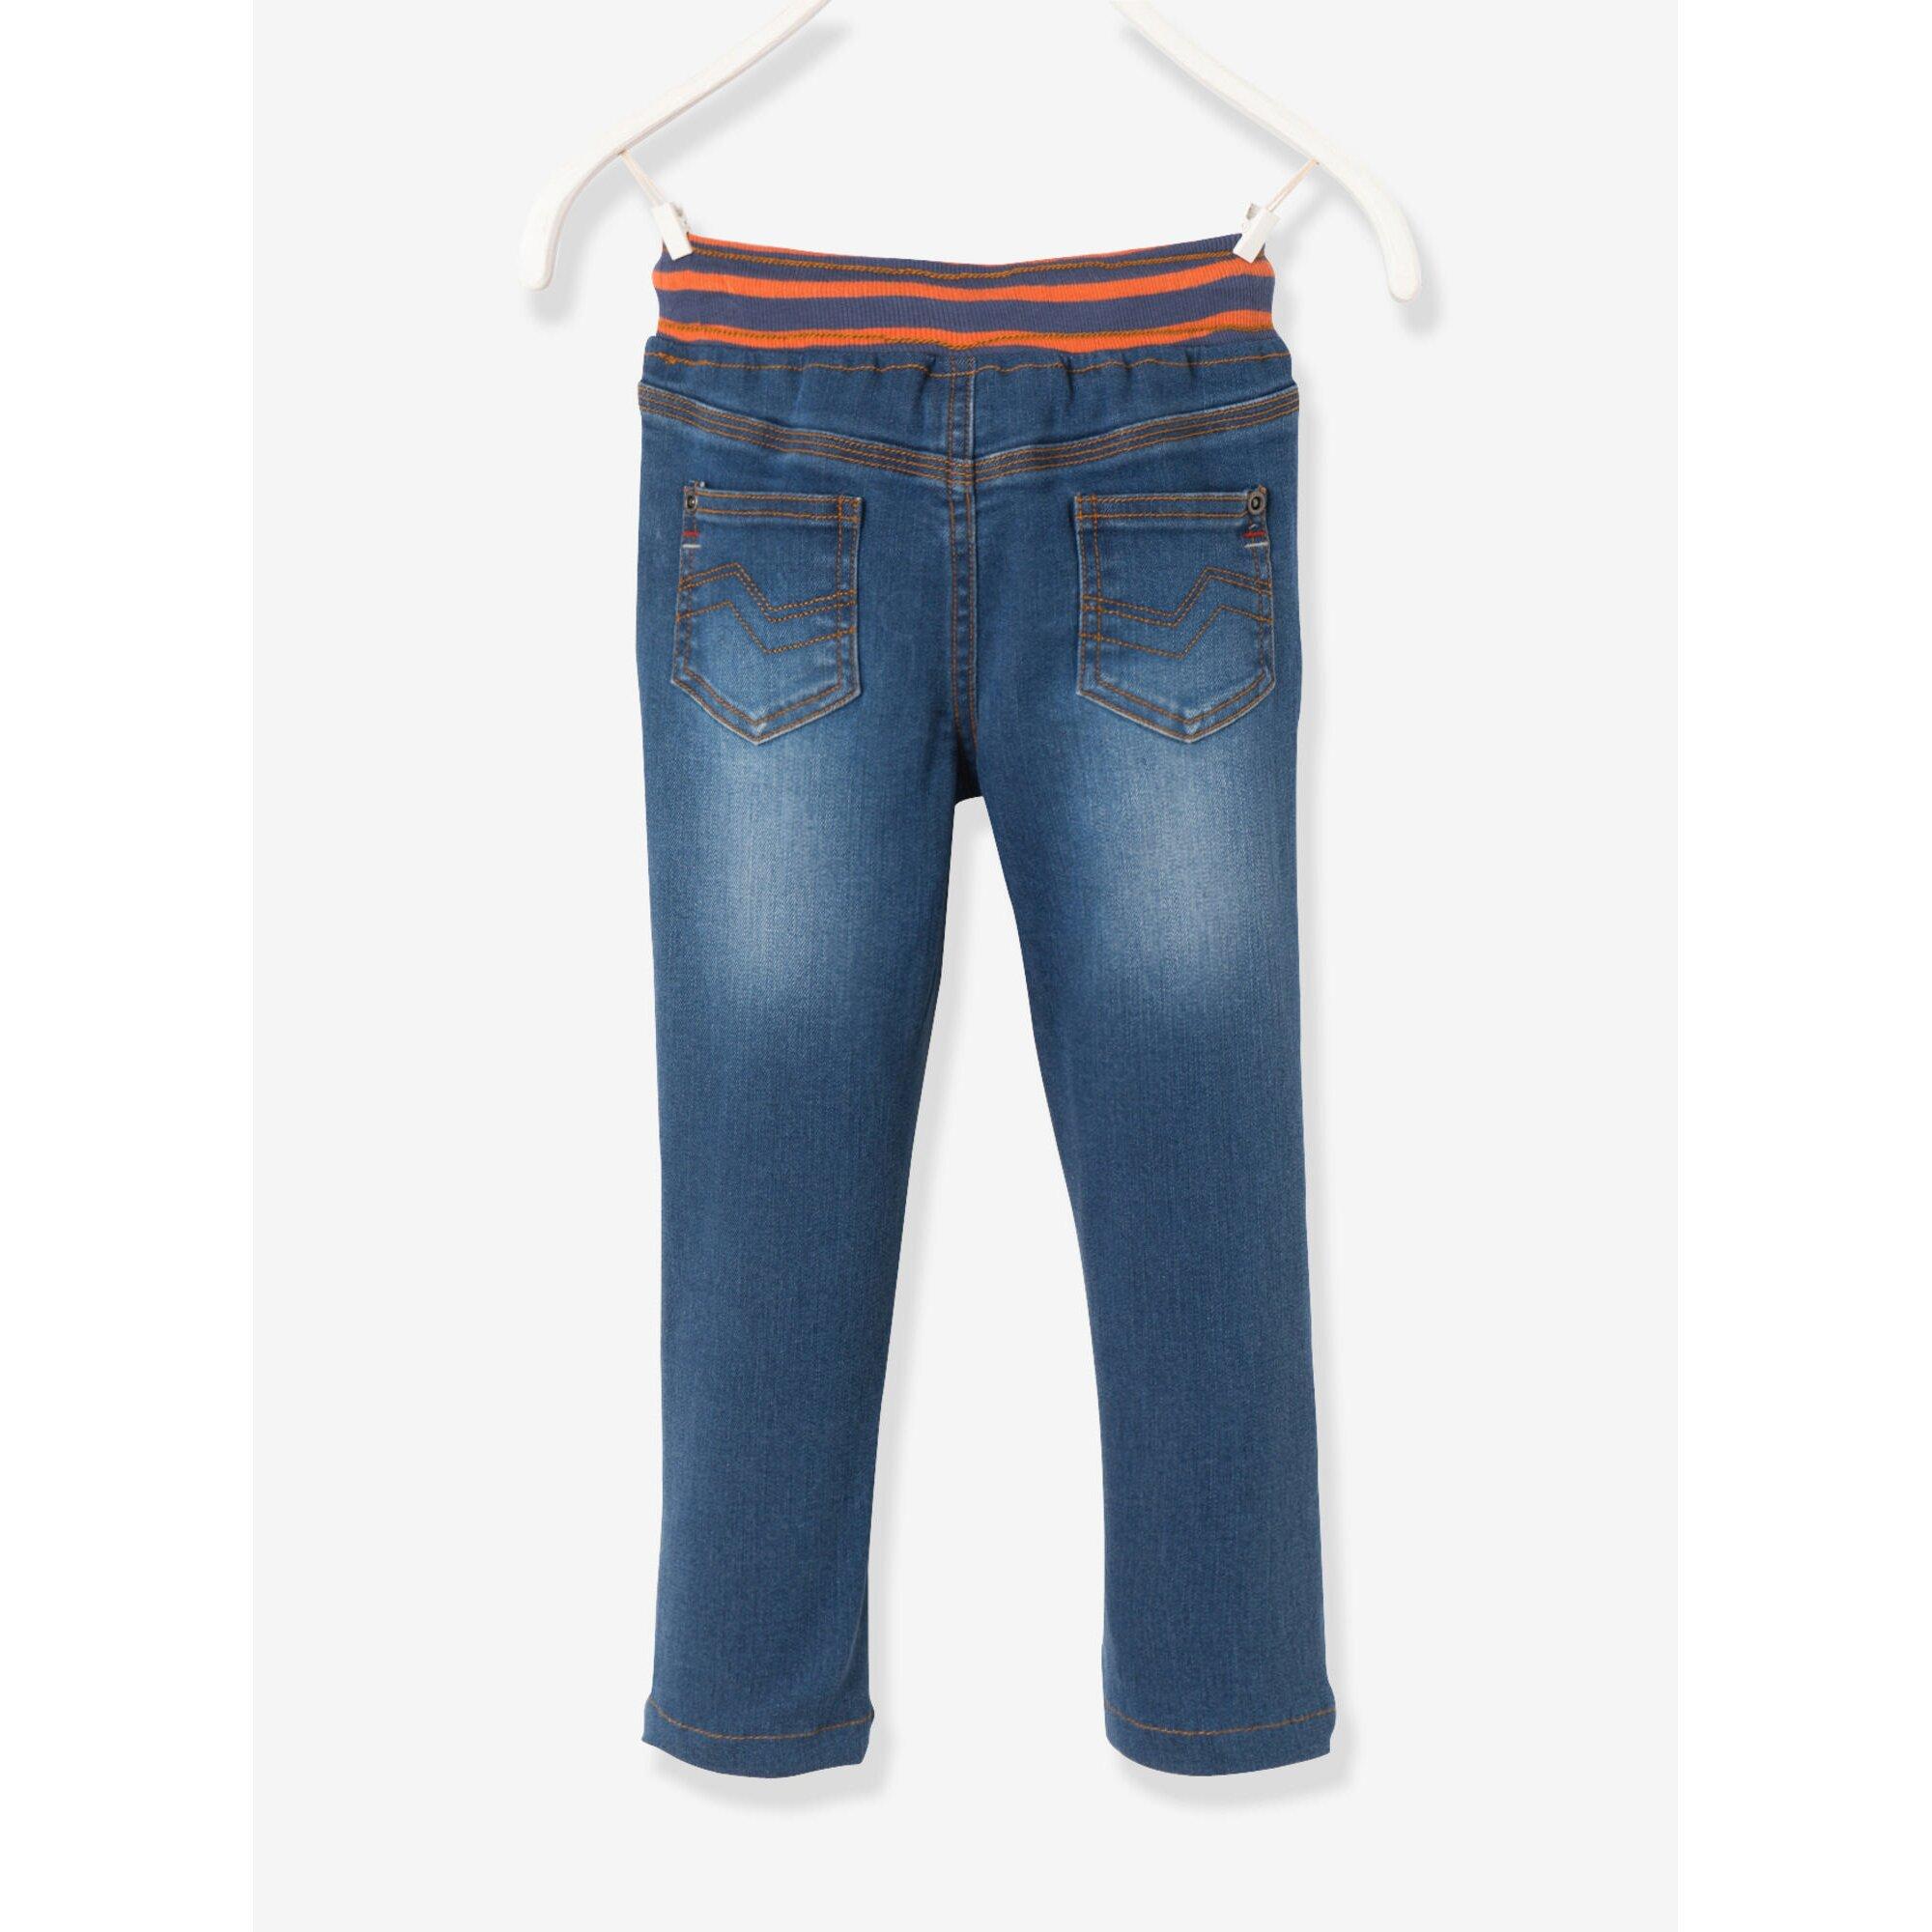 vertbaudet-jeans-fur-jungen-huftweite-regular